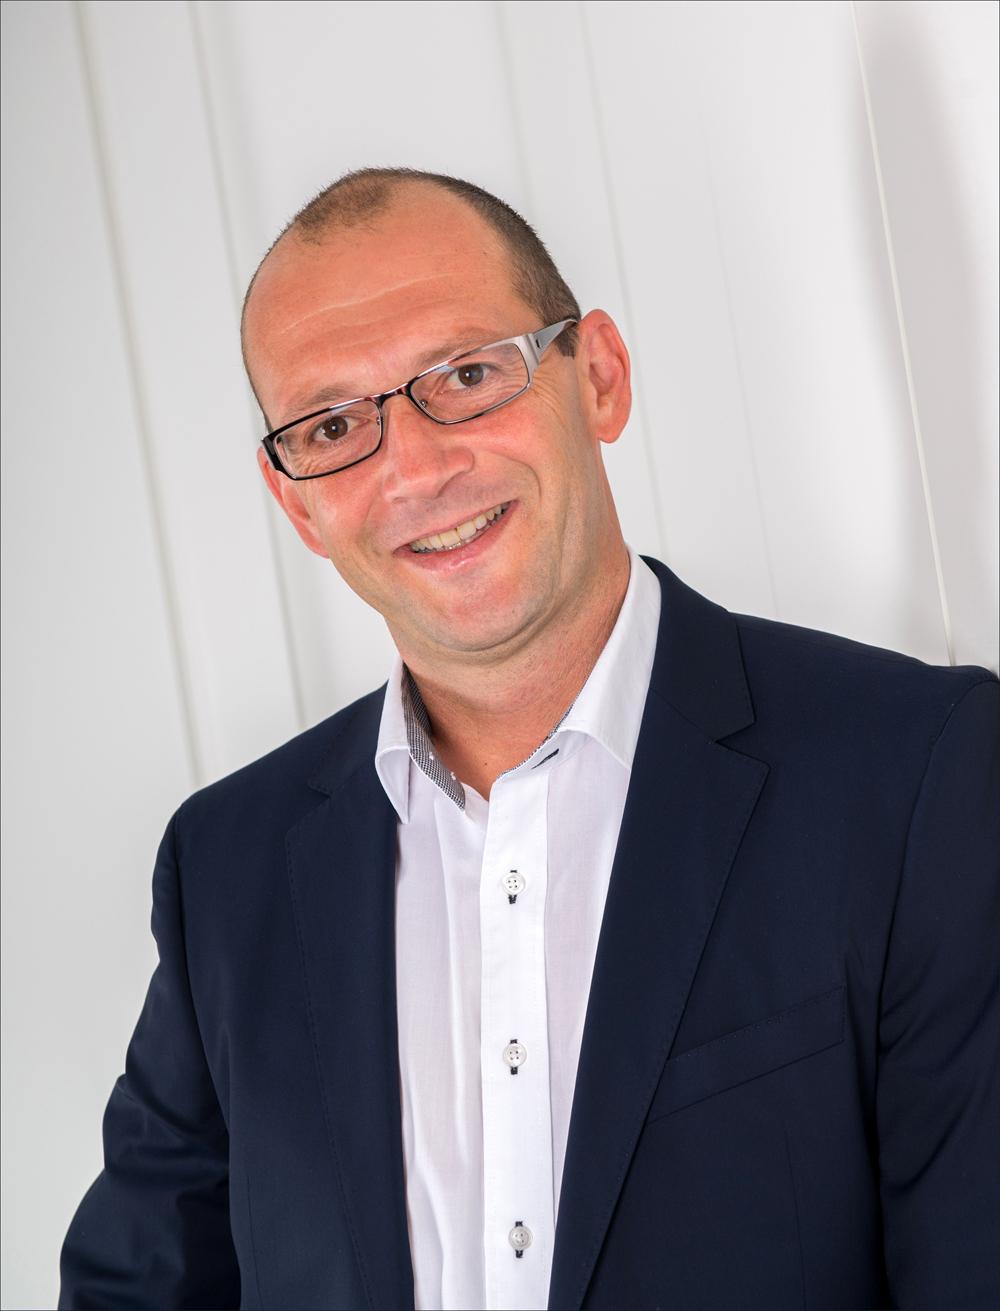 Oliver Hofbauer, CEO